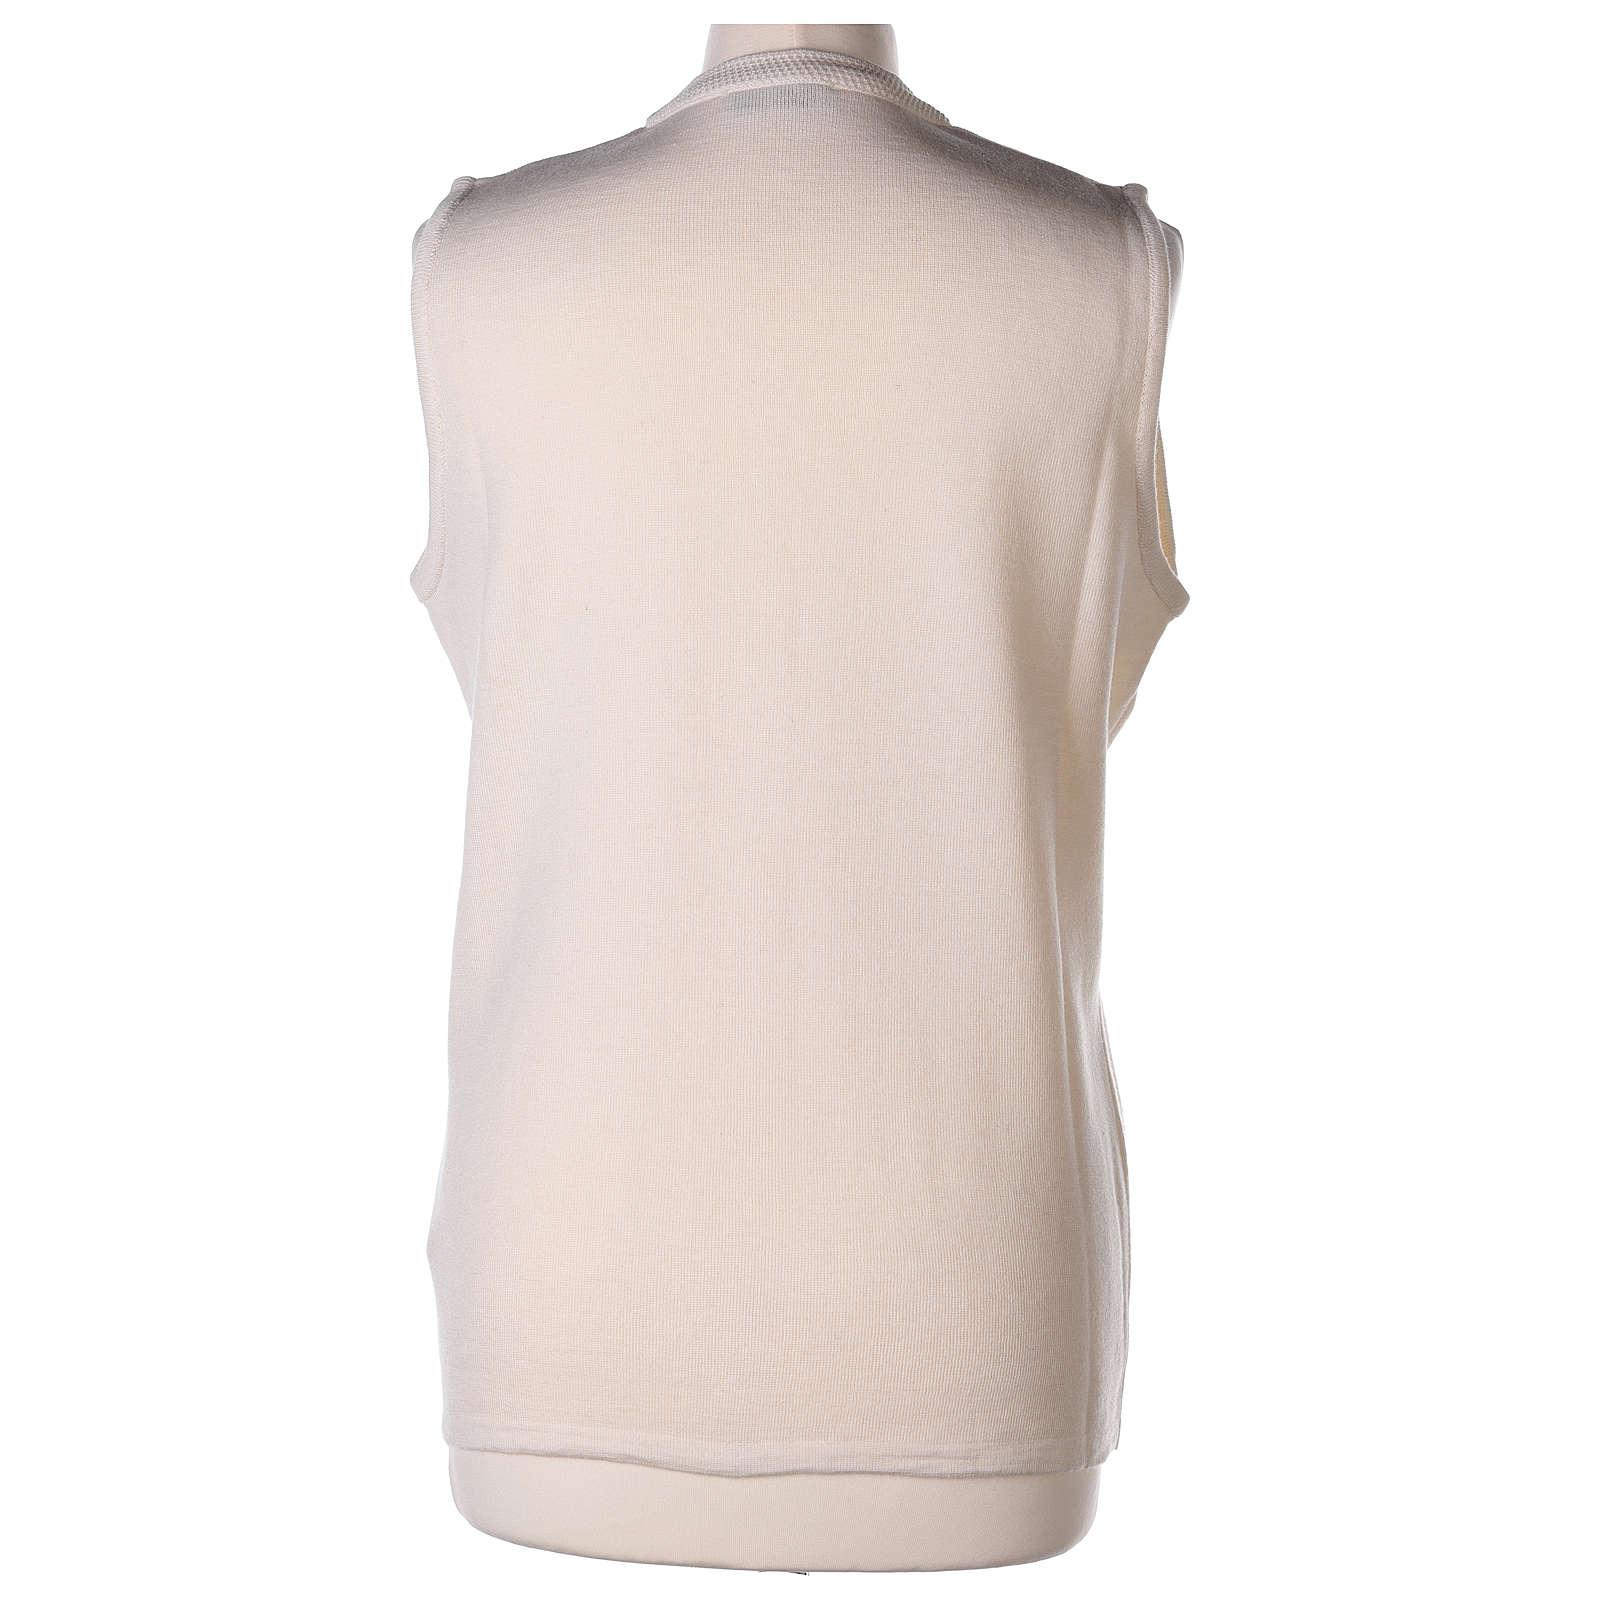 Chaleco blanco monja con bolsillos cuello V 50% acrílico 50% lana merina In Primis 4